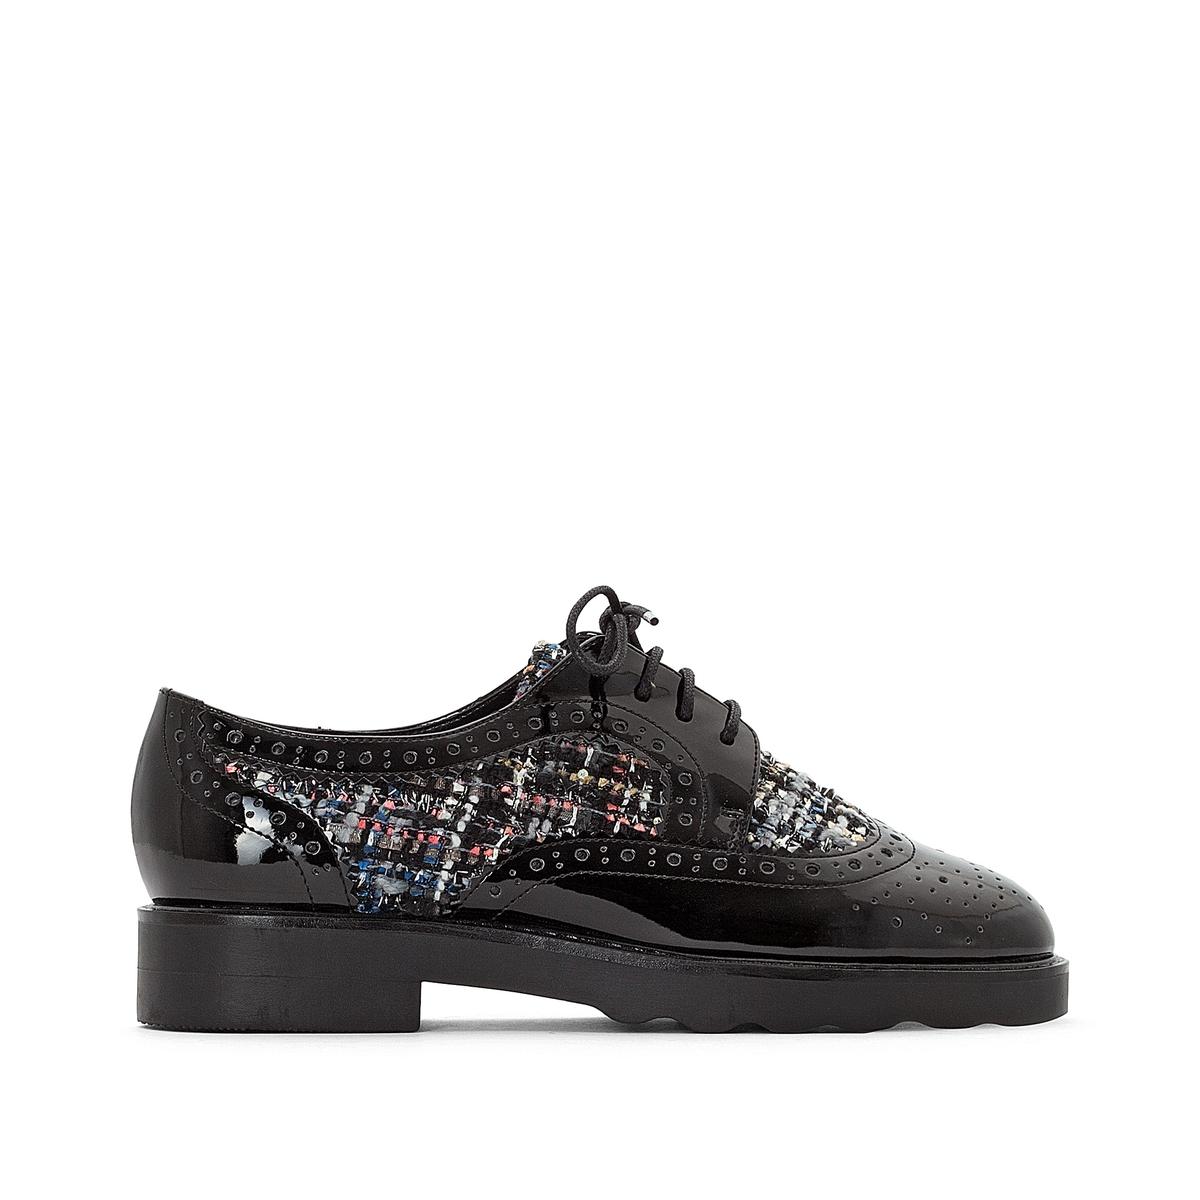 Ботинки-дерби из синтетического материала ботинки дерби с пайетками 26 39